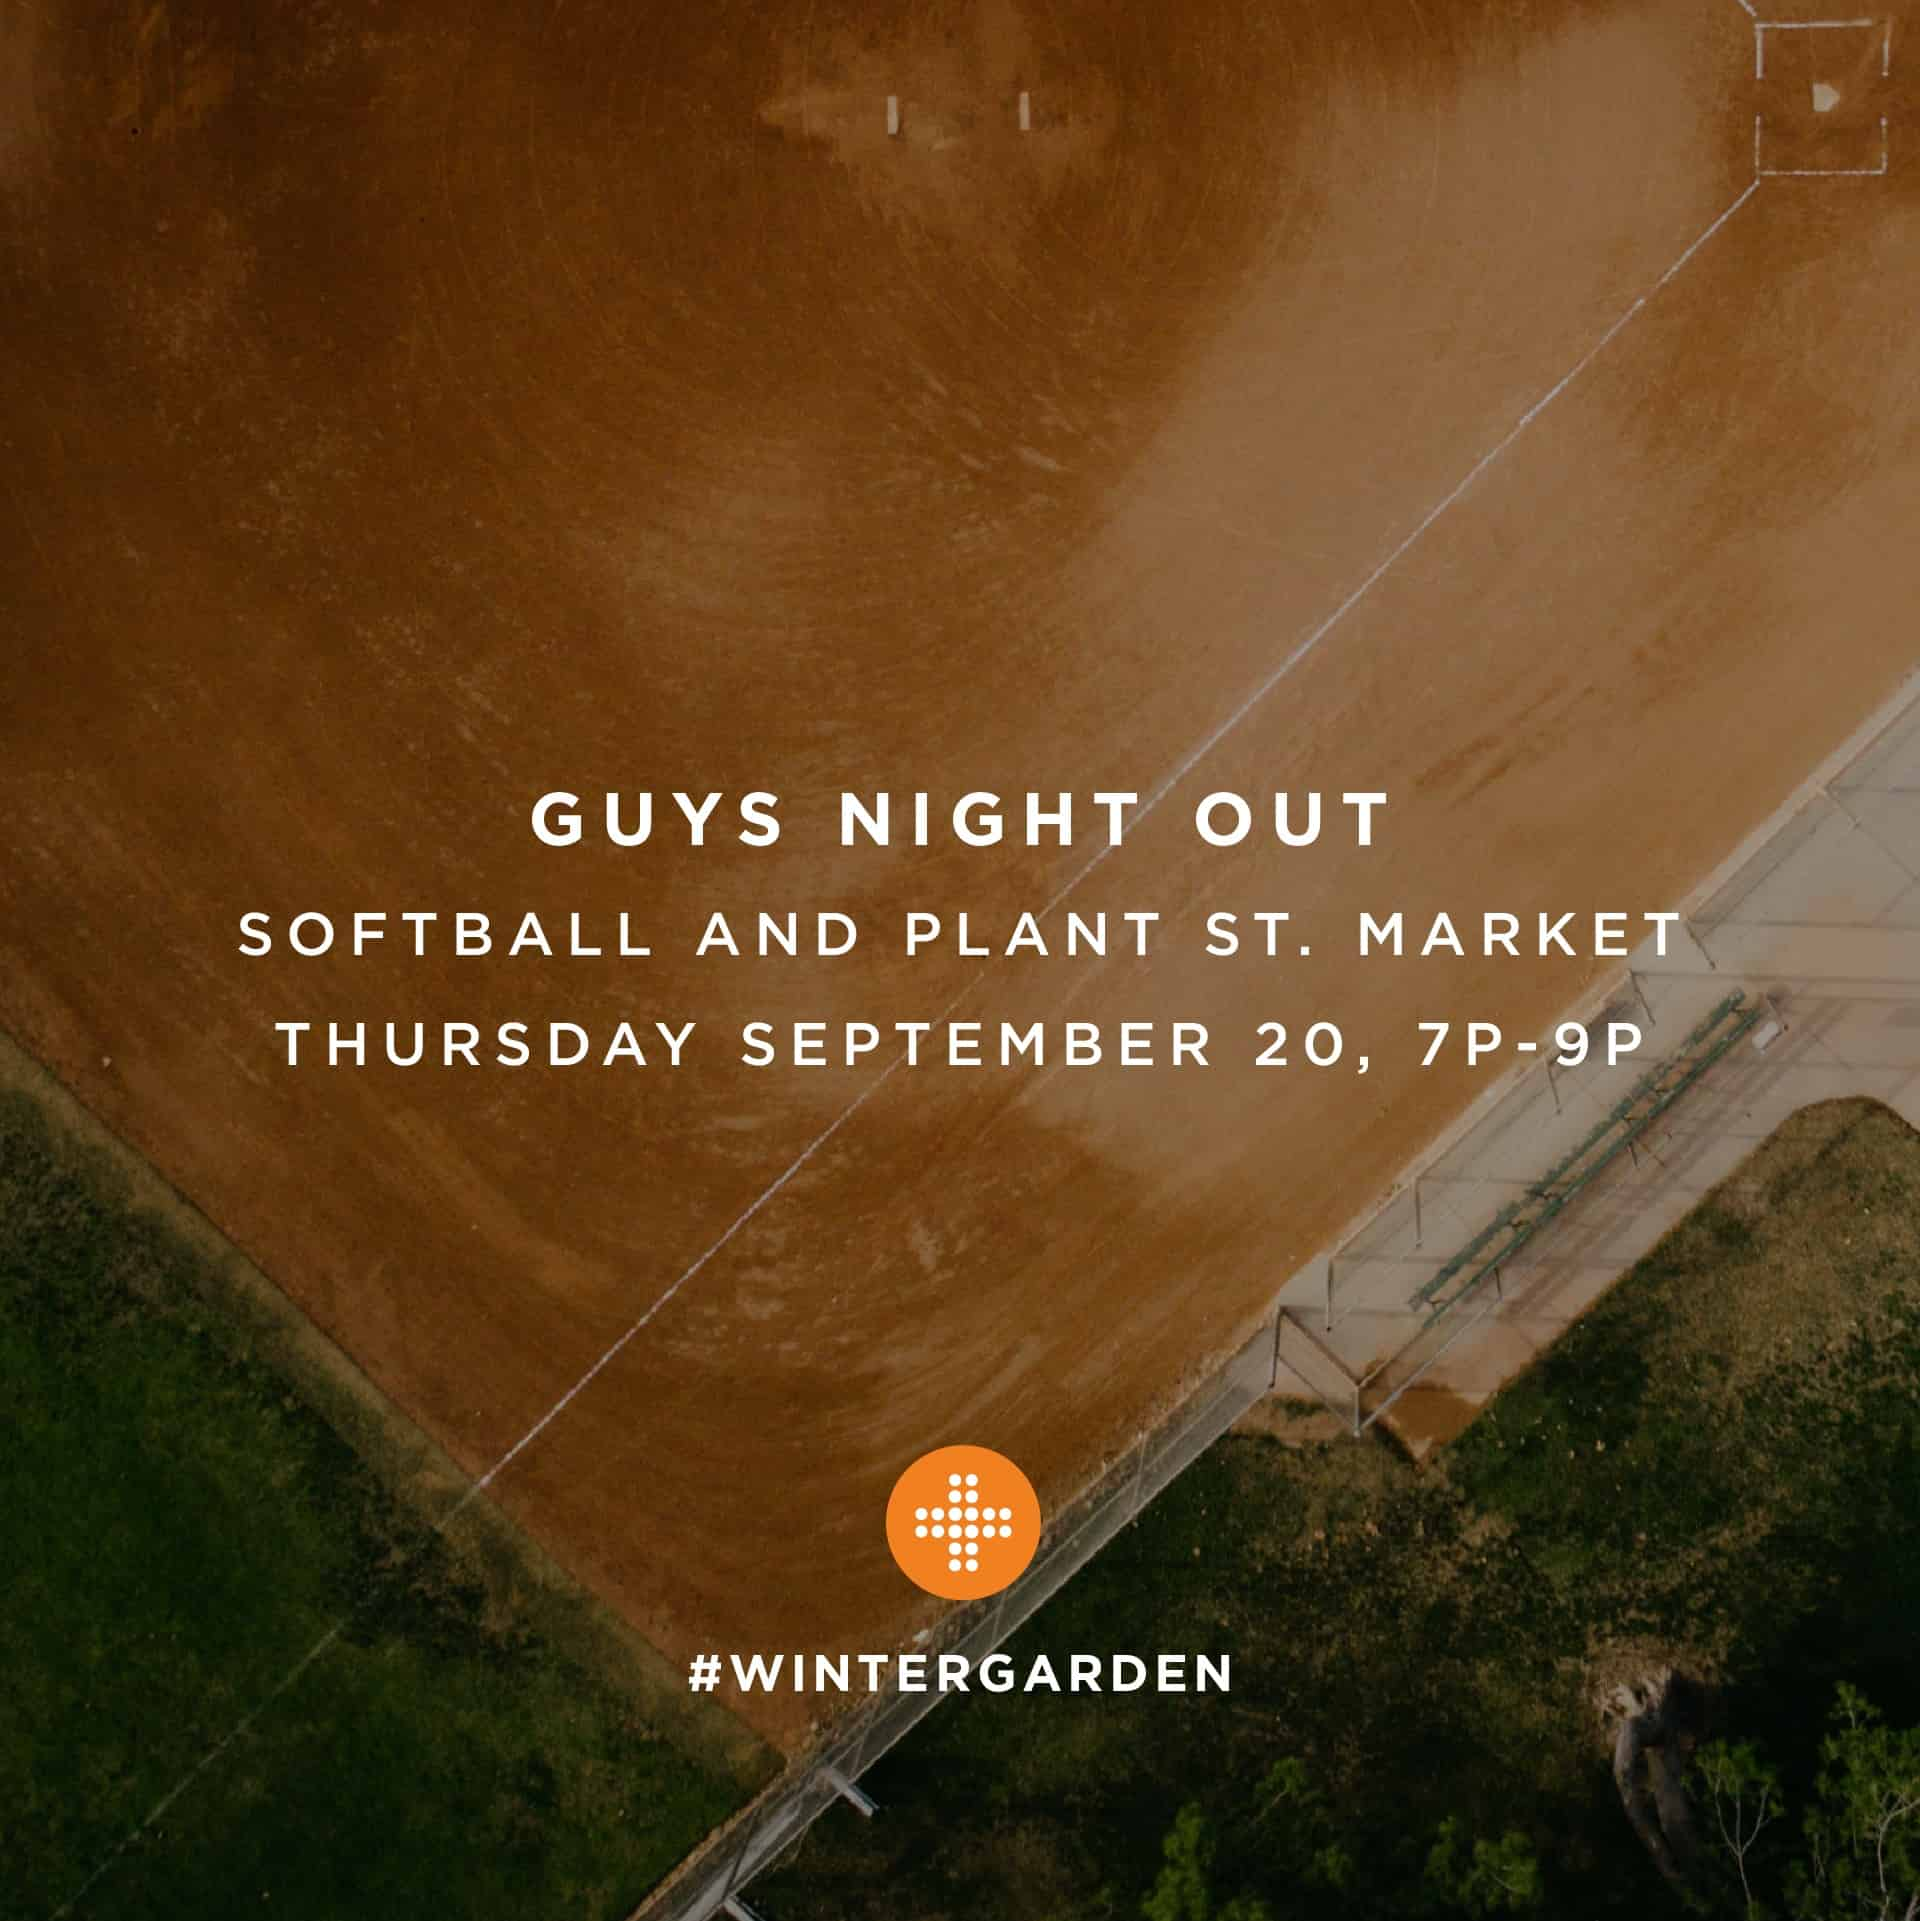 Incroyable Winter Garden Guys Night Out: Softball